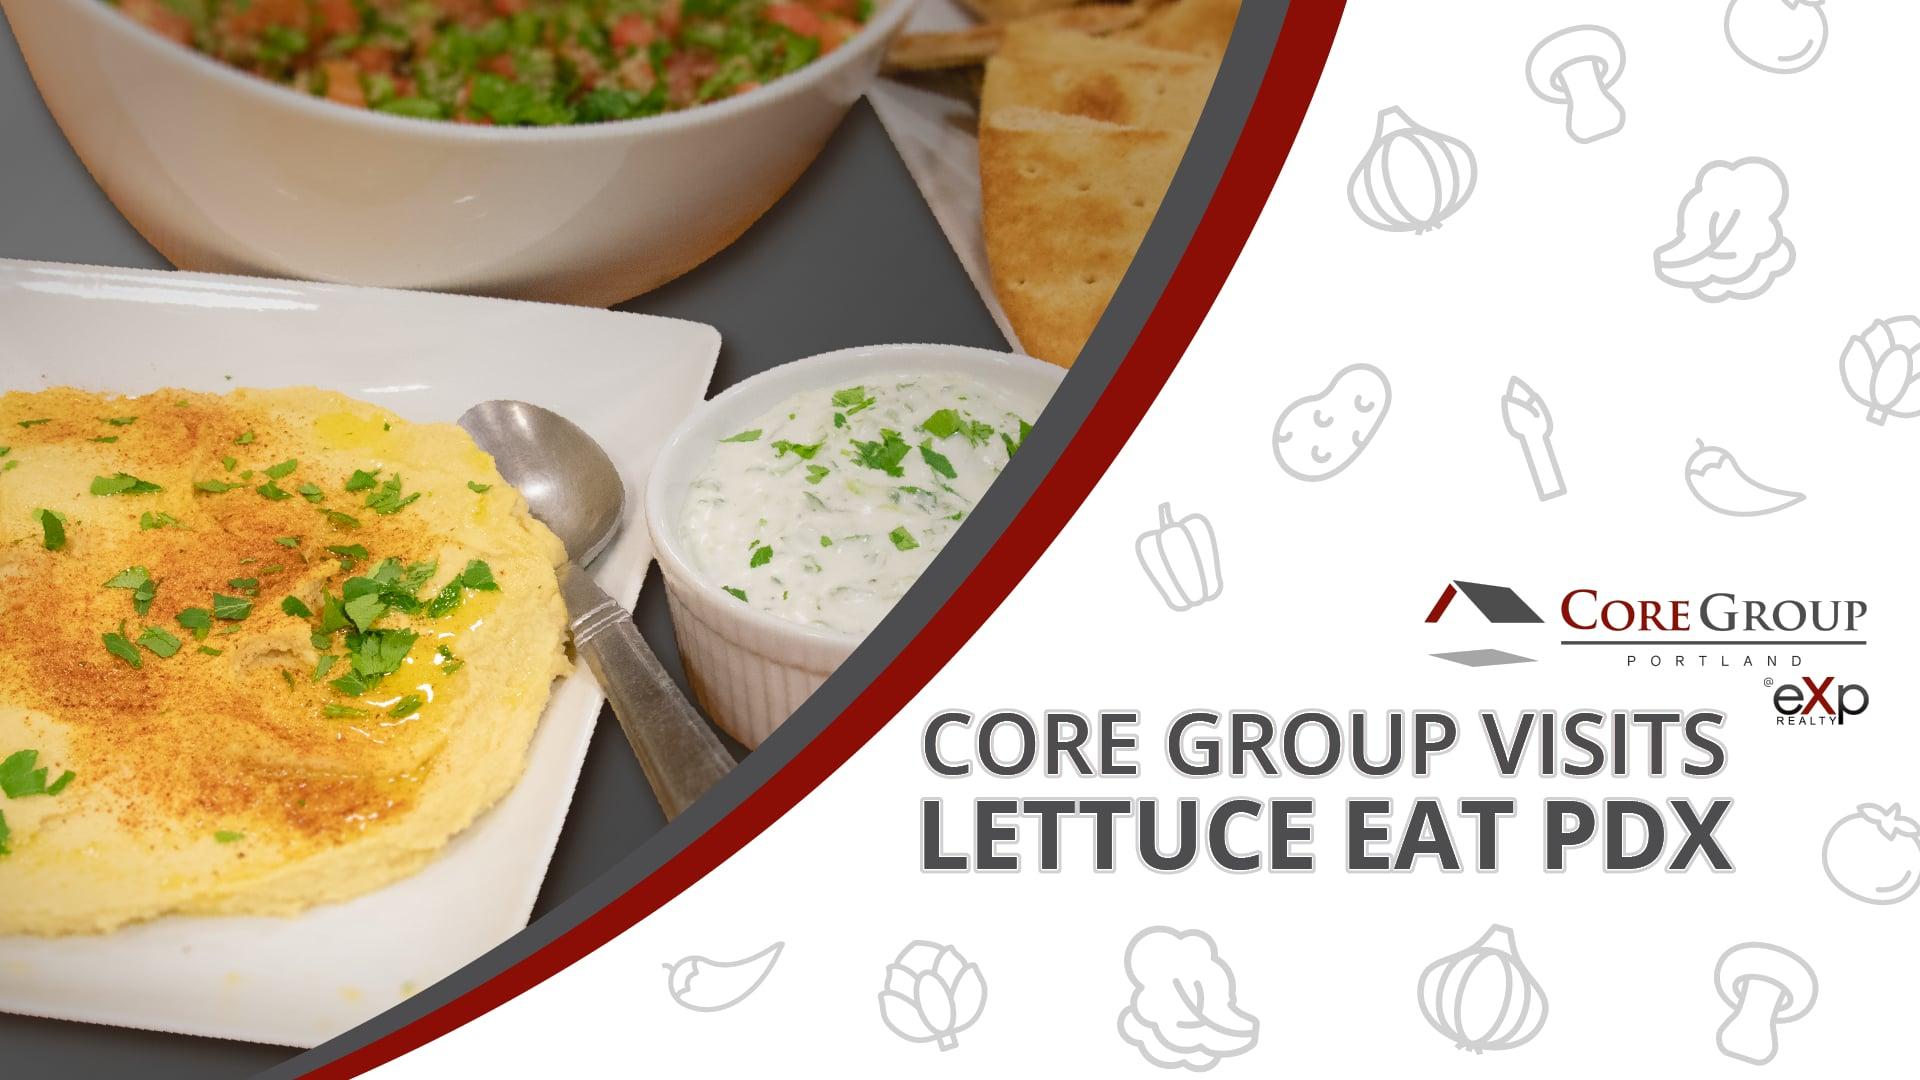 Core Group @ Lettuce Eat PDX